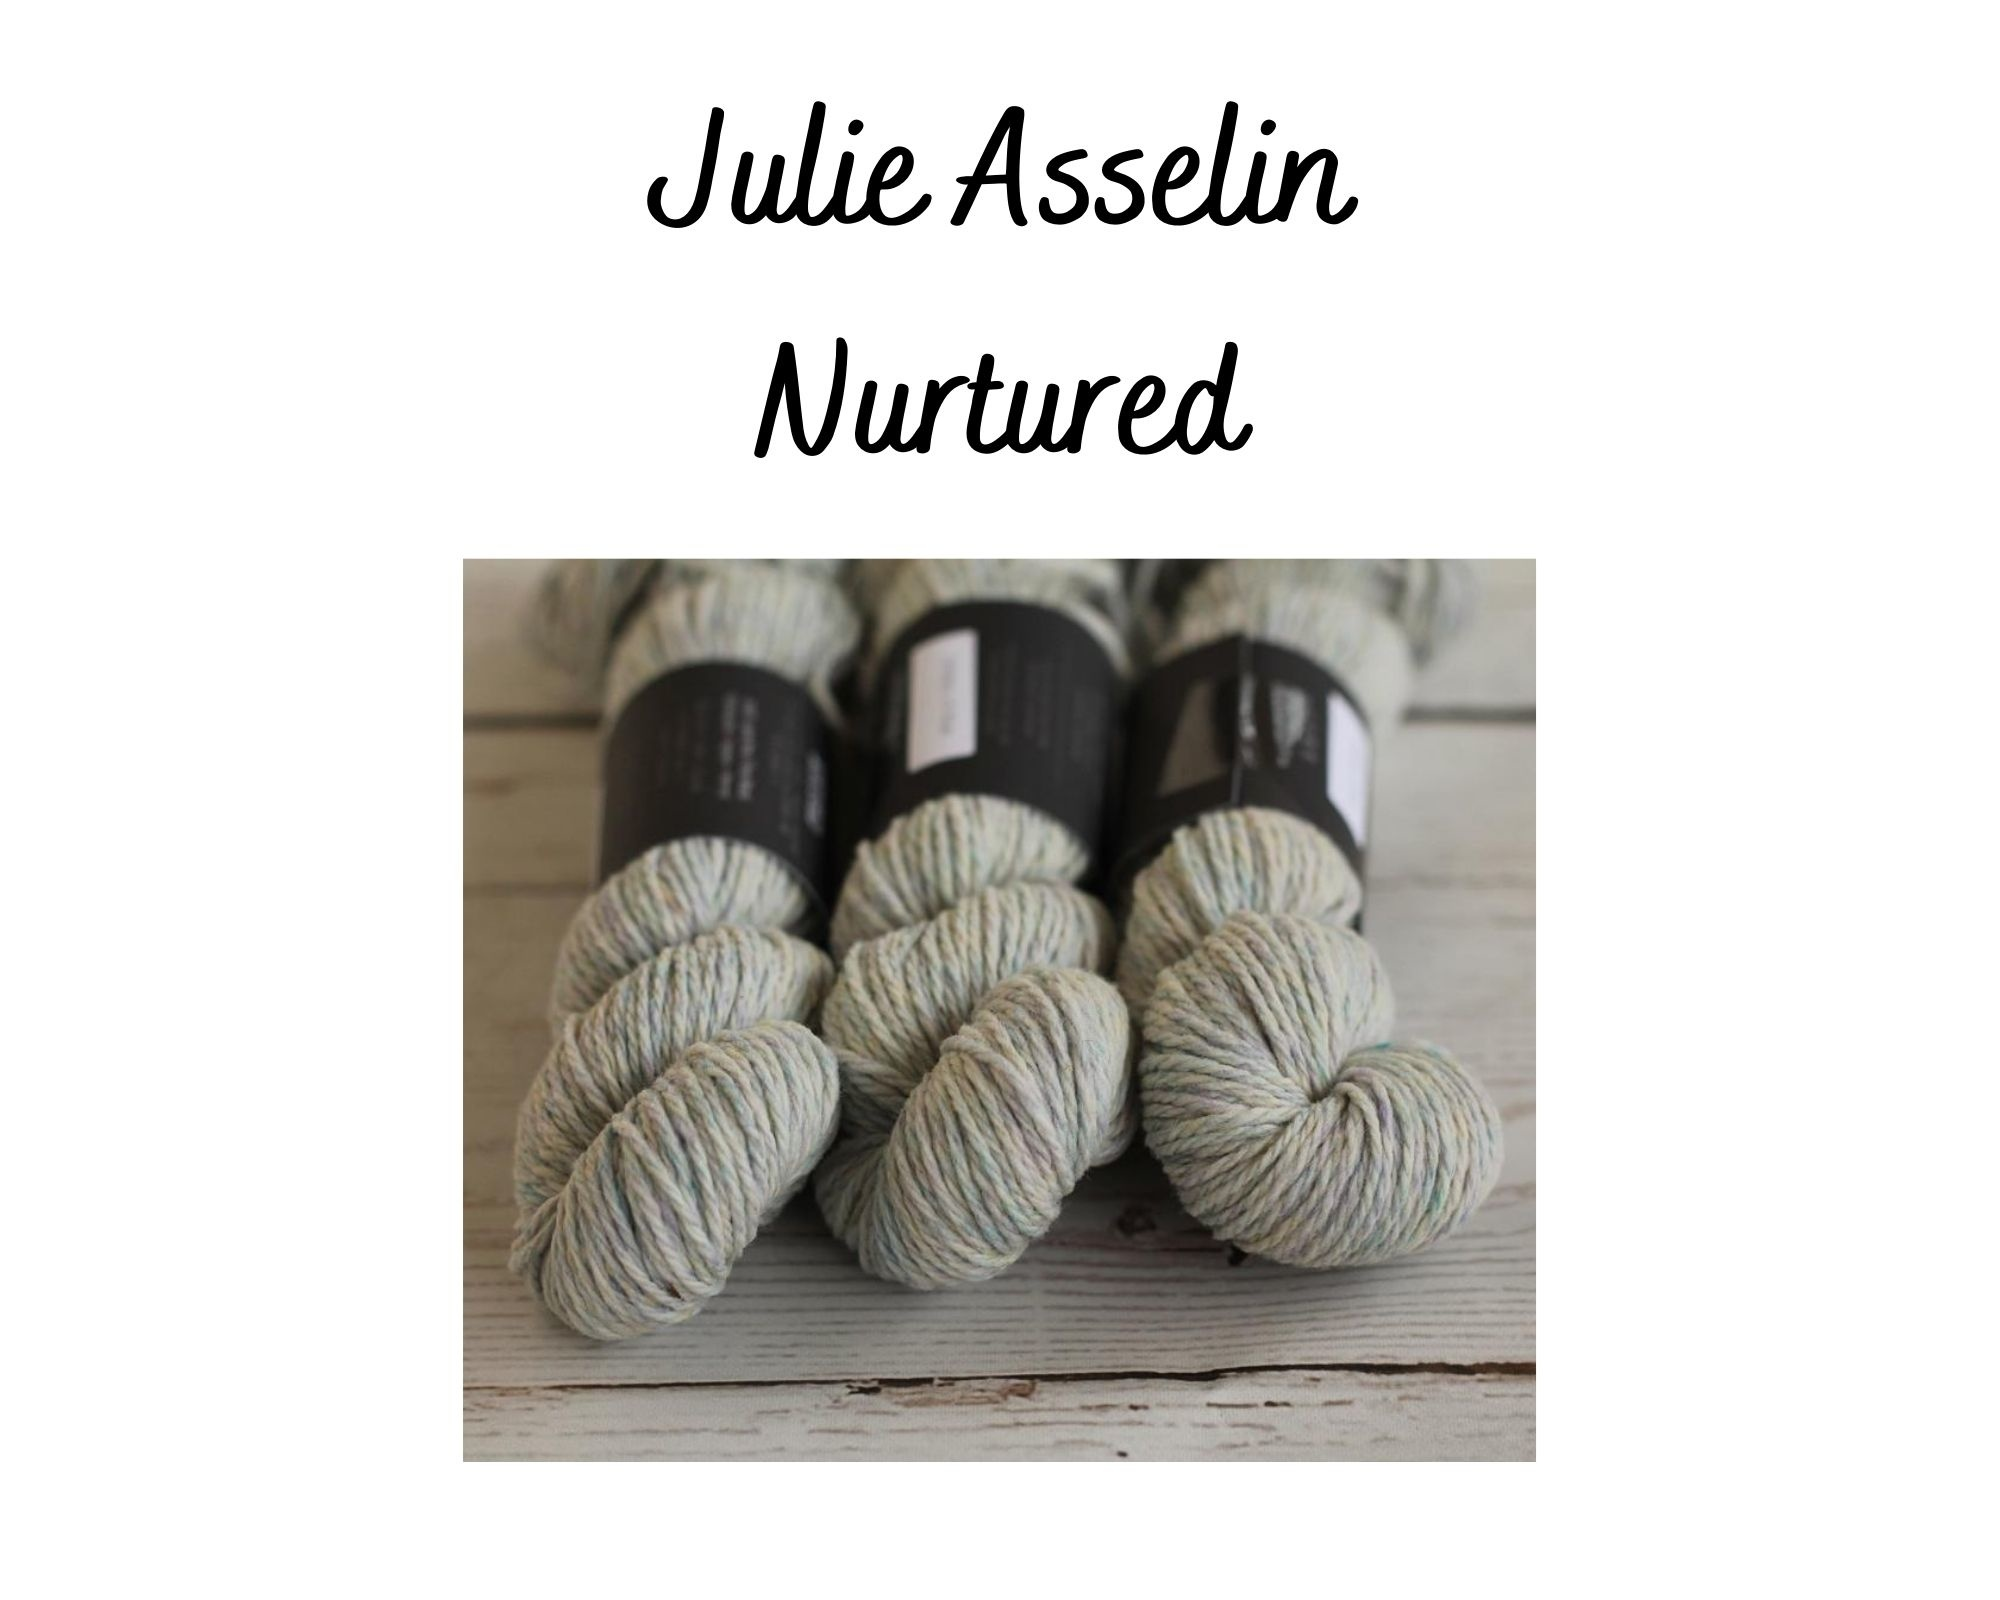 Julie Asselin Julie Asselin Nurtured